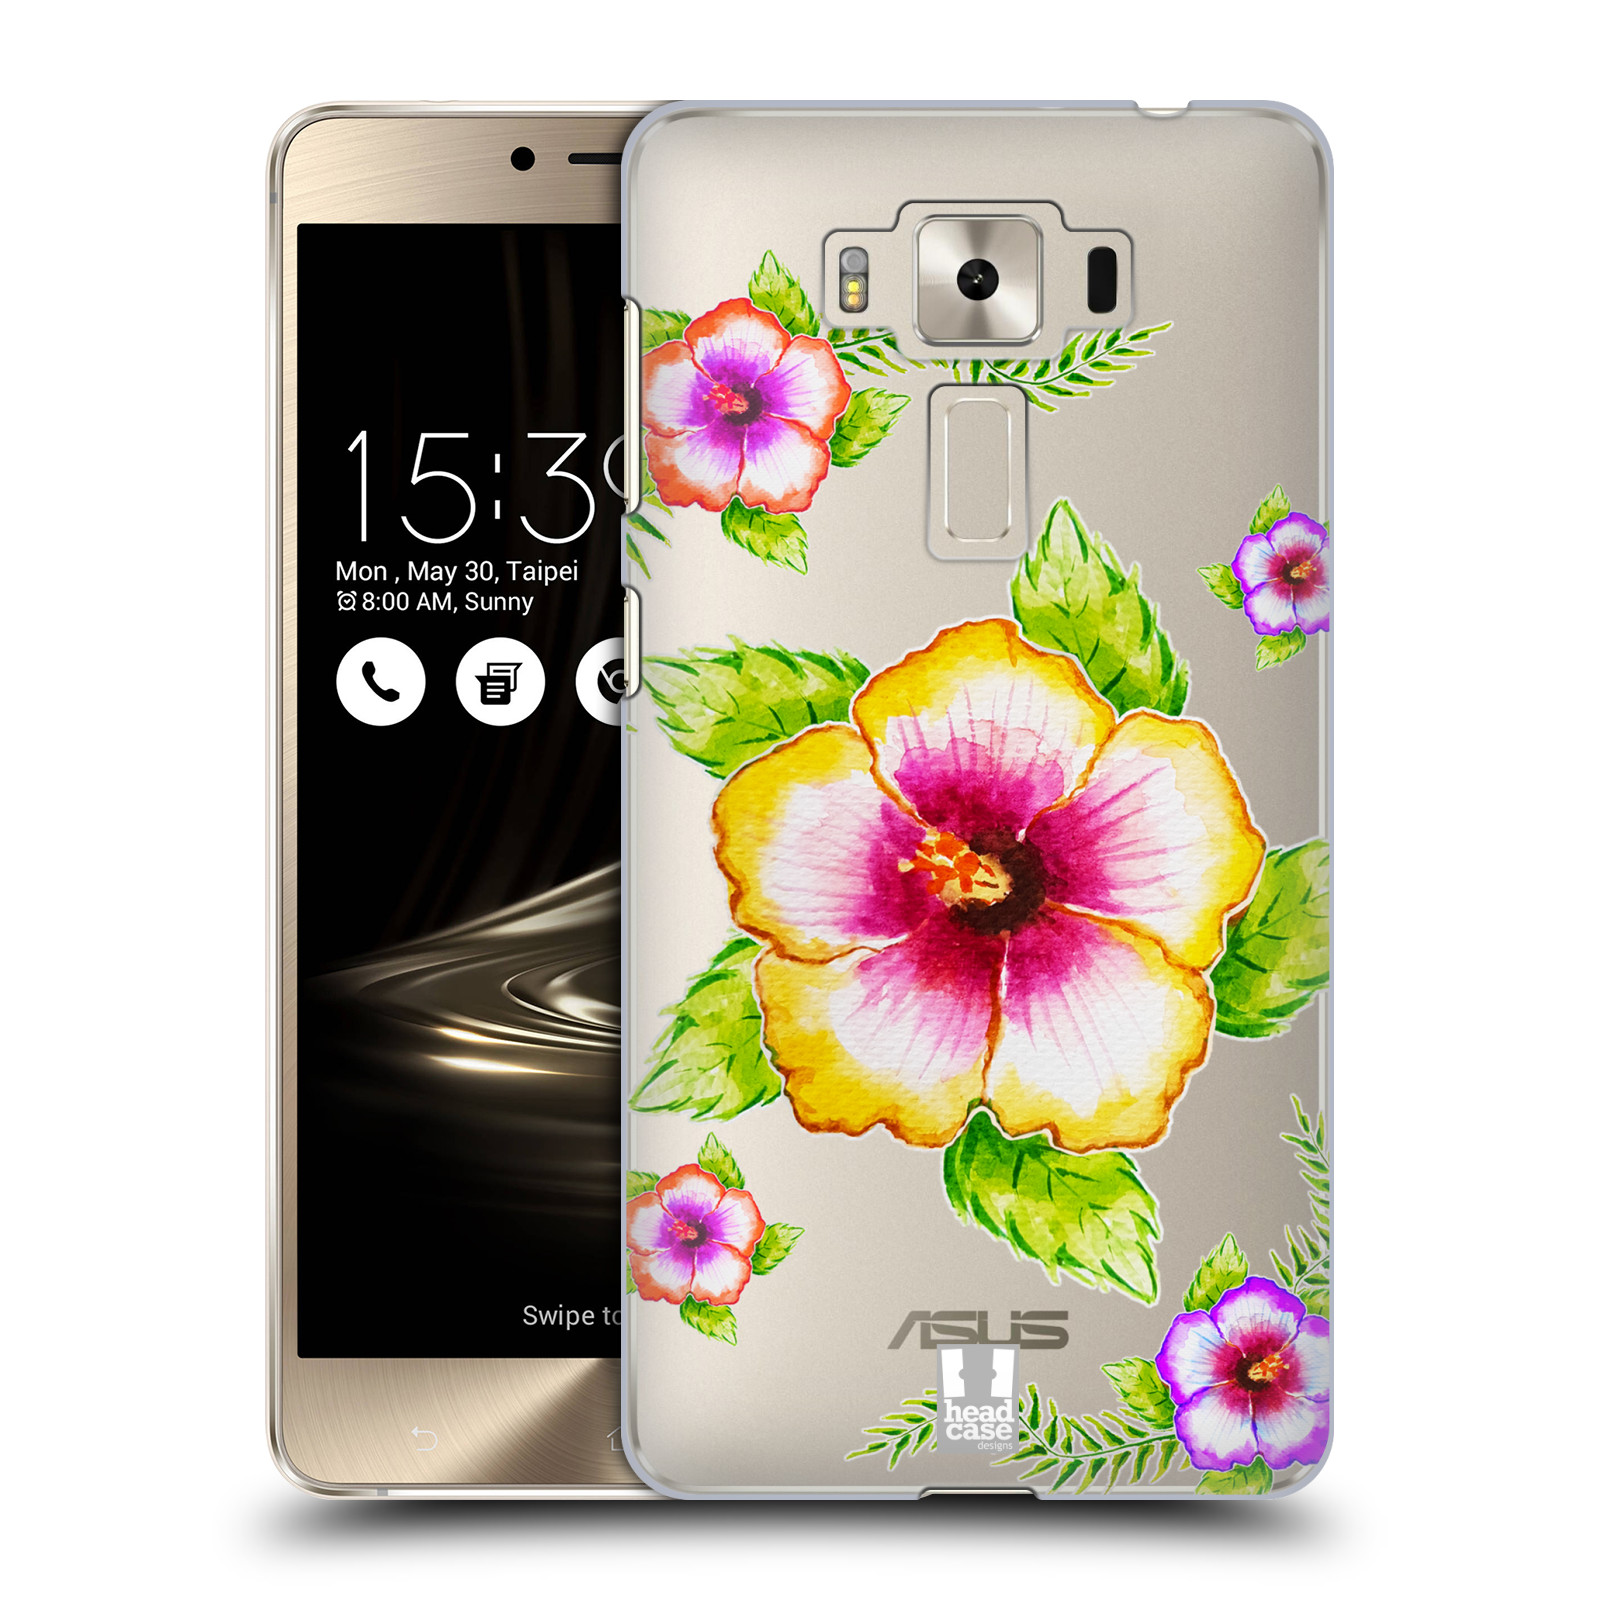 HEAD CASE plastový obal na mobil Asus Zenfone 3 DELUXE ZS550KL Květina Ibišek vodní barvy